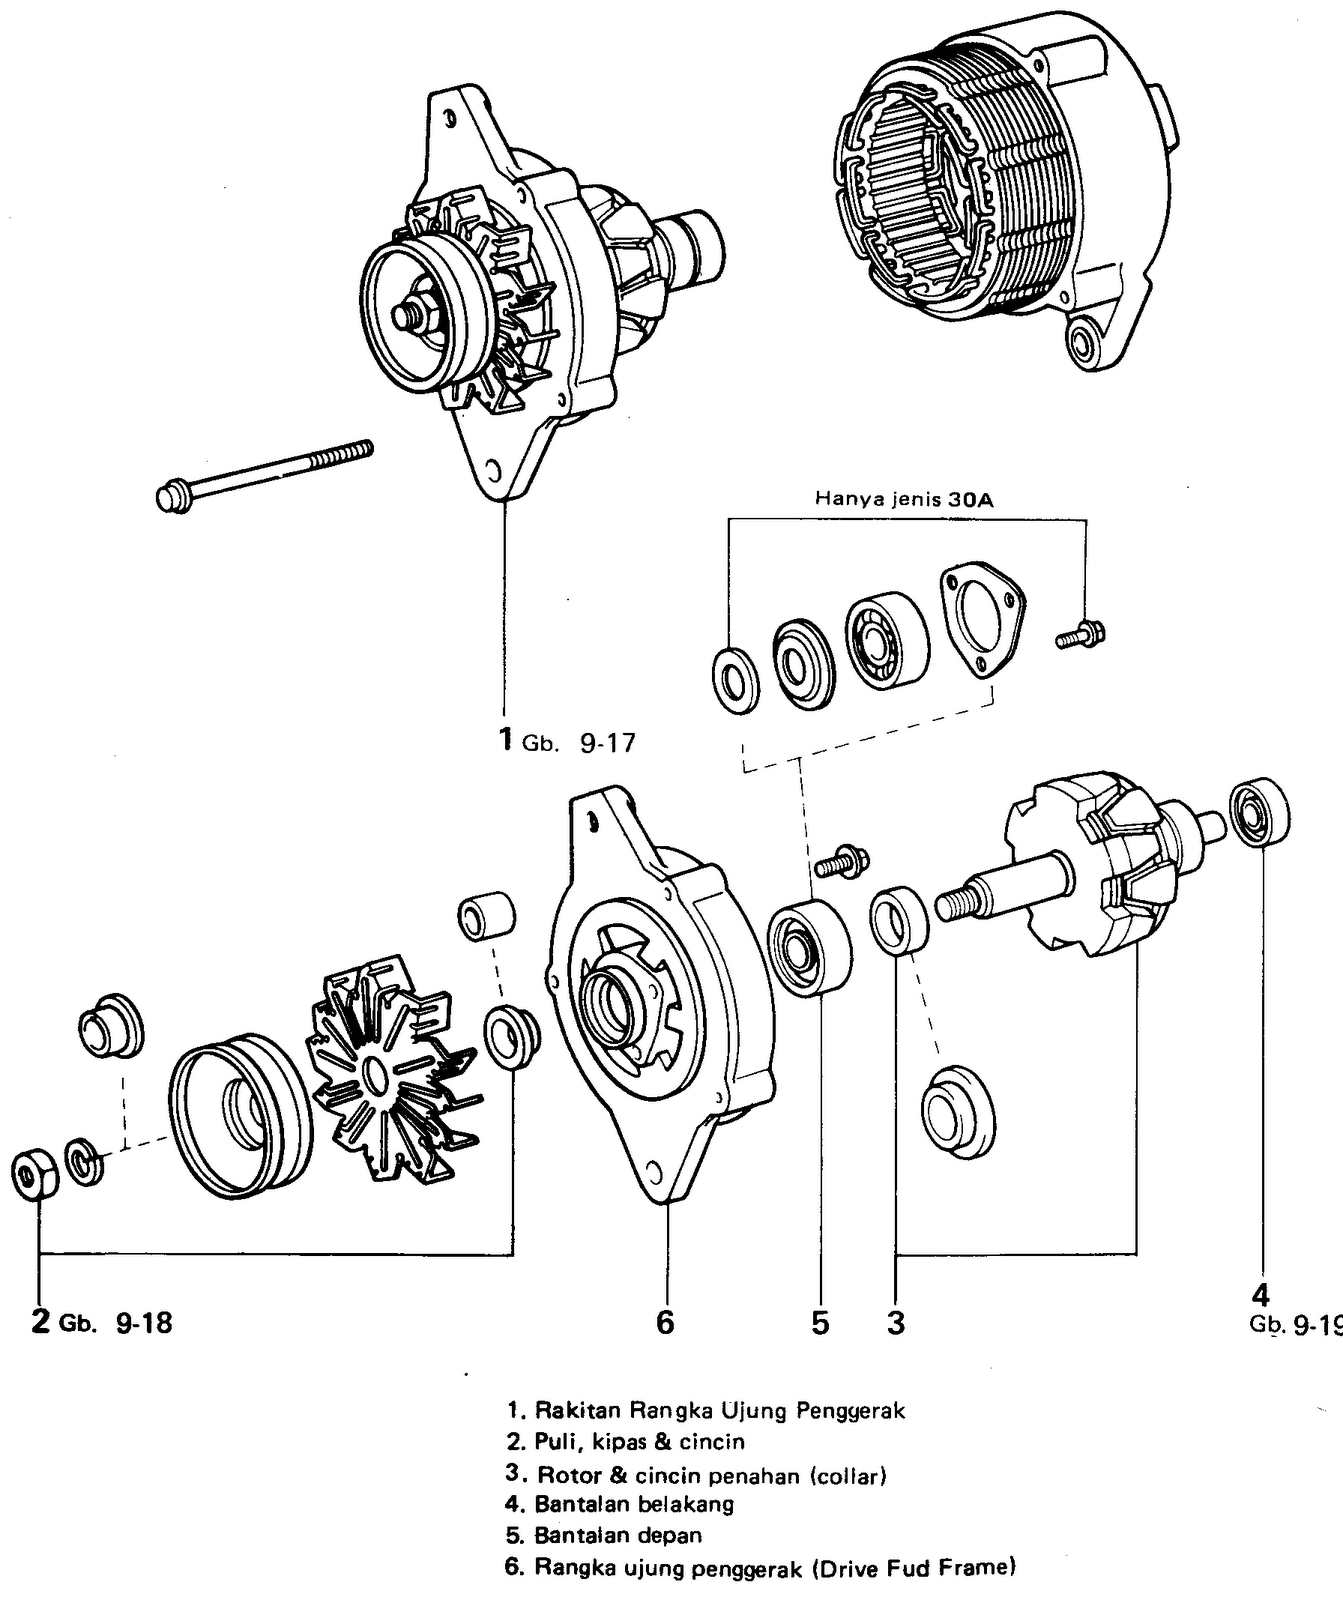 Susunan alternator regulator mekanik